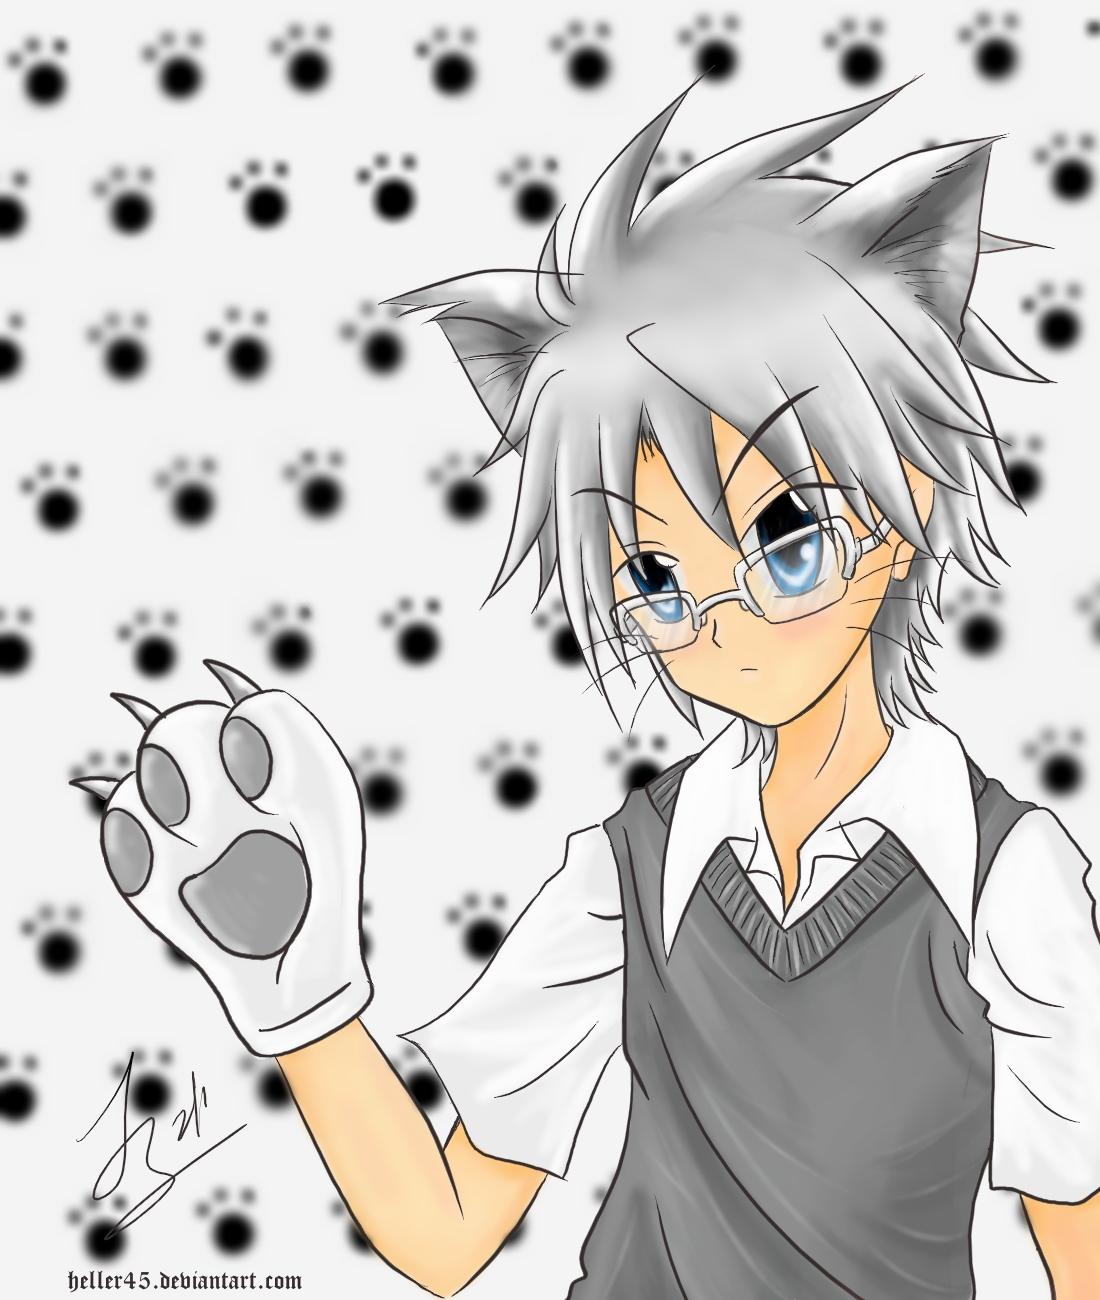 Cute Anime Wallpapers: Neko Boy Wallpaper